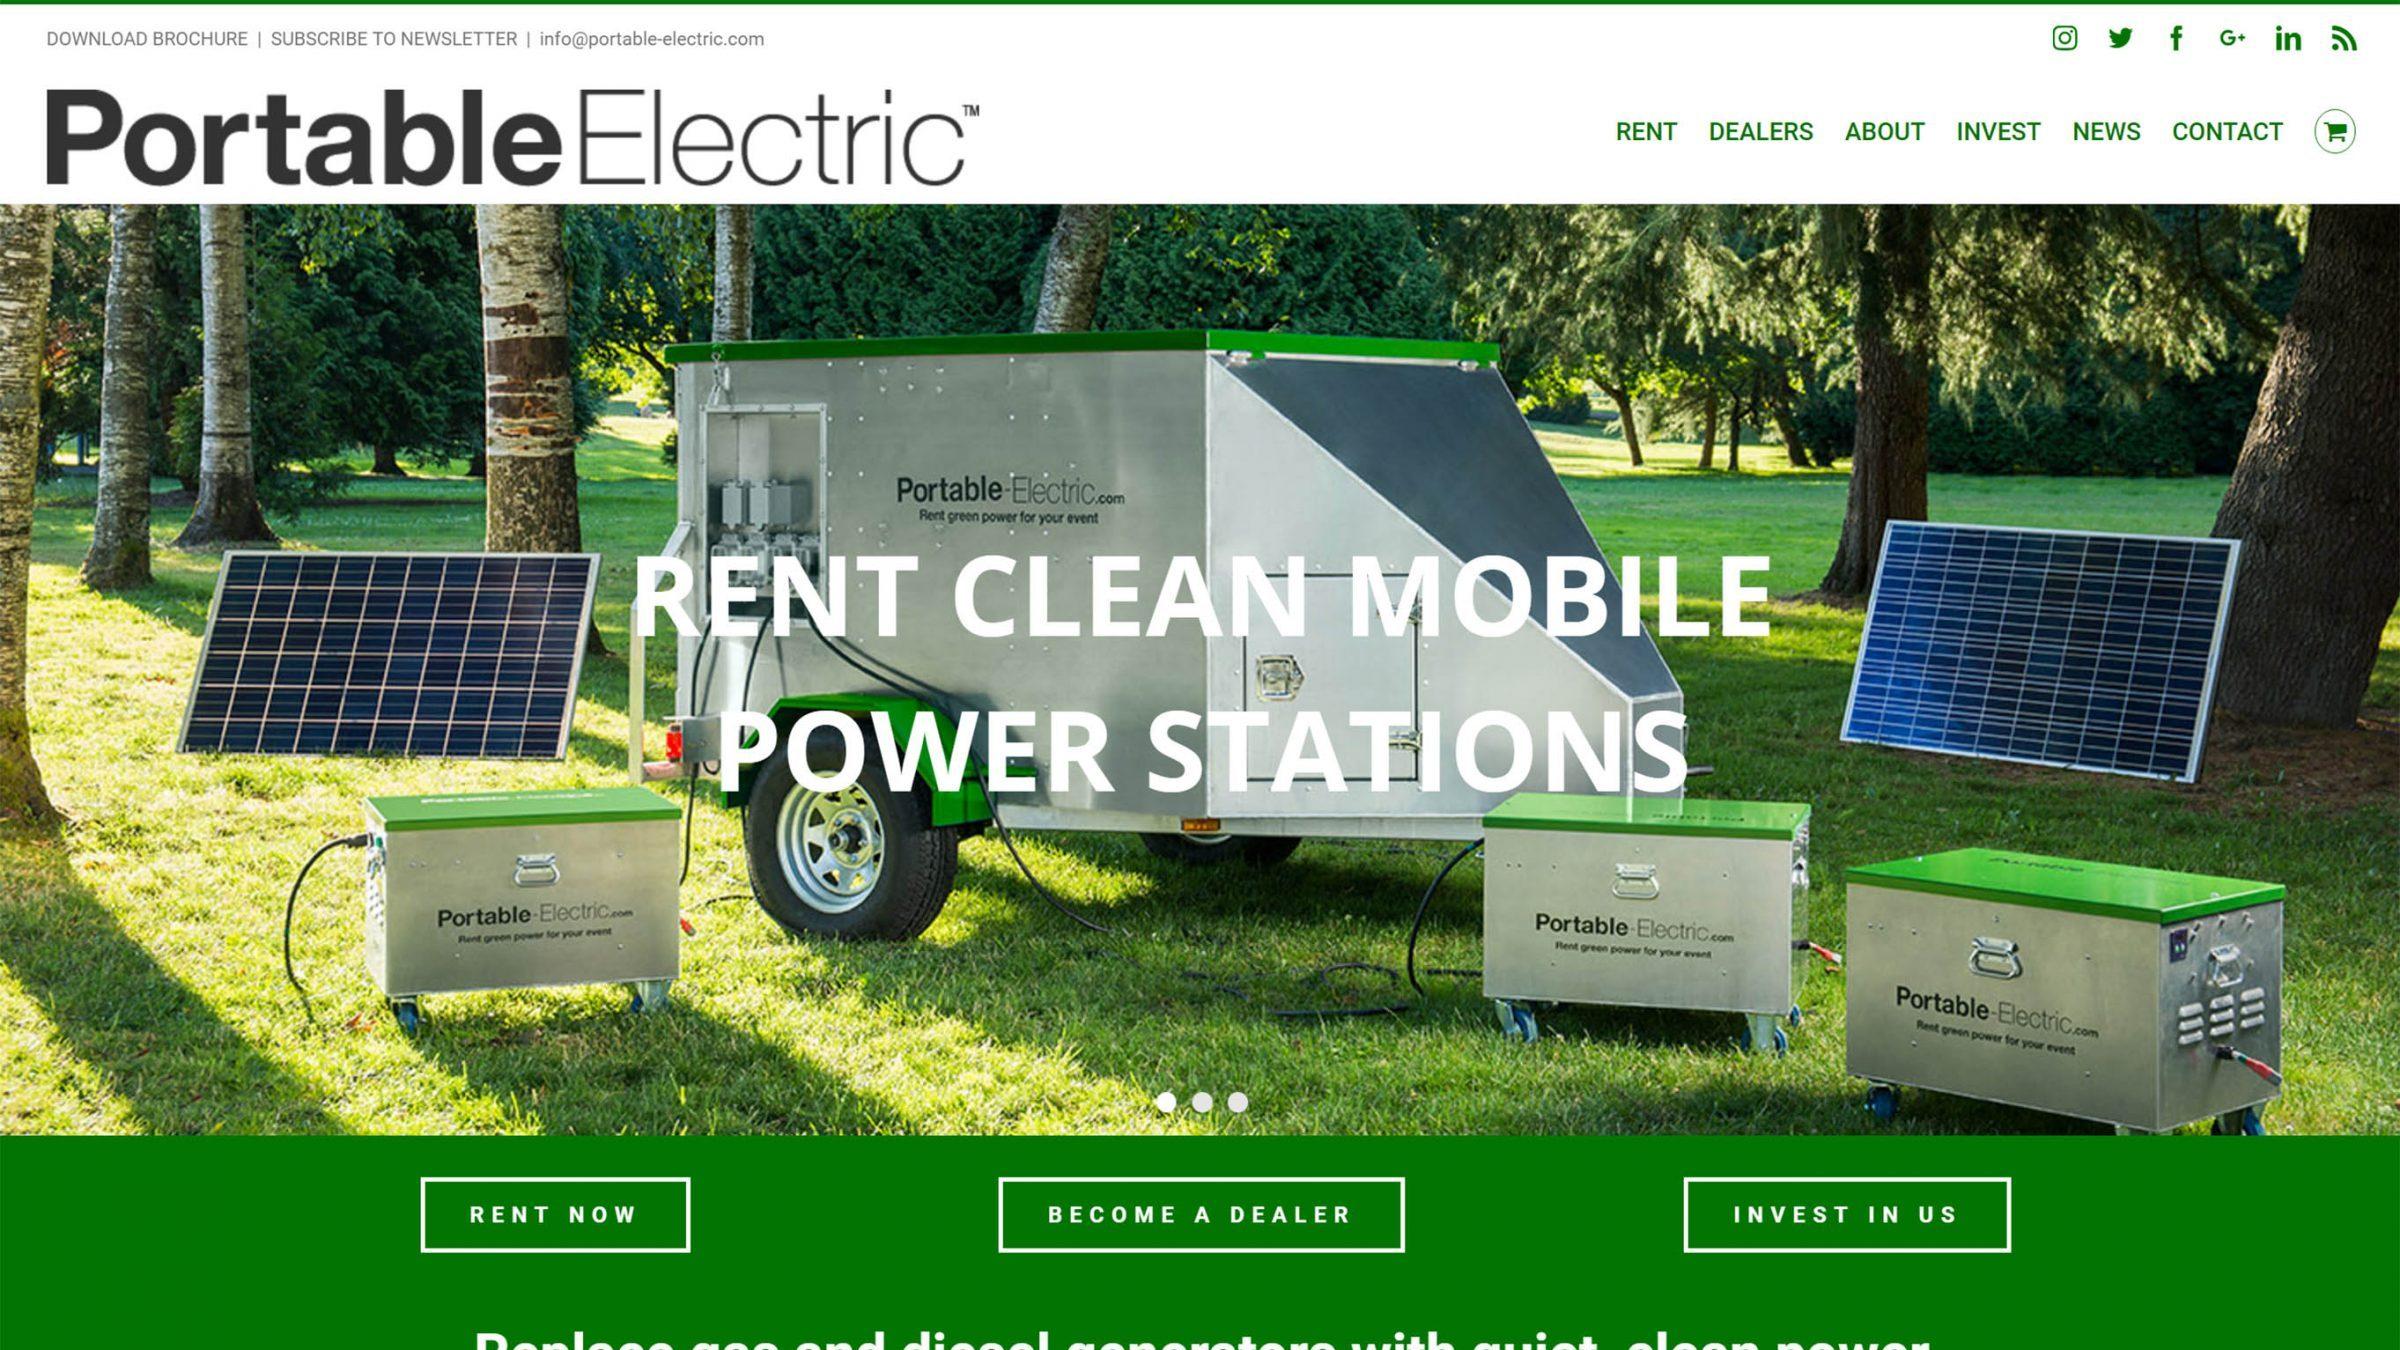 Portable-Electric